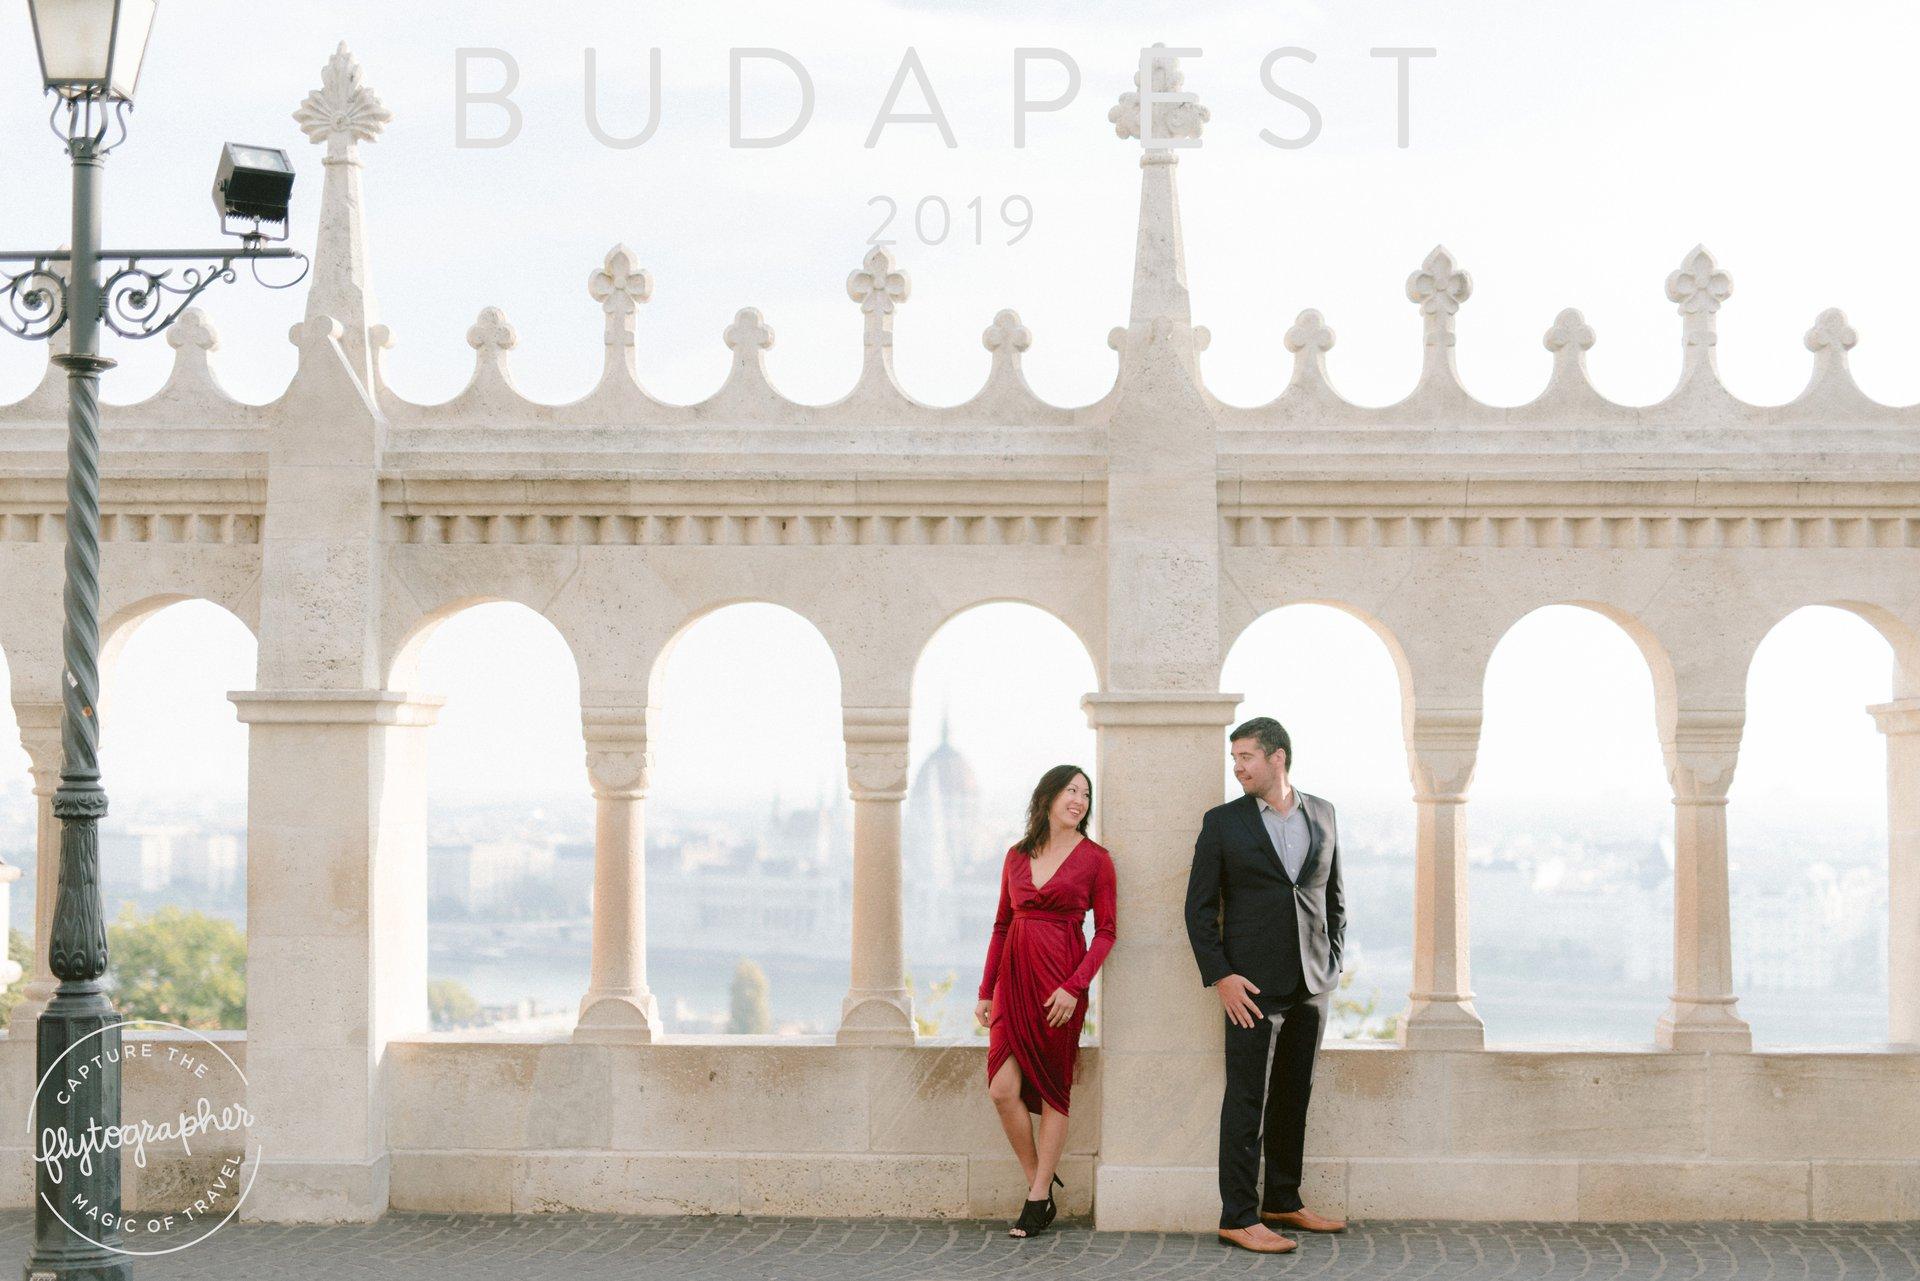 Flytographer Travel Story - Anniversary in Budapest